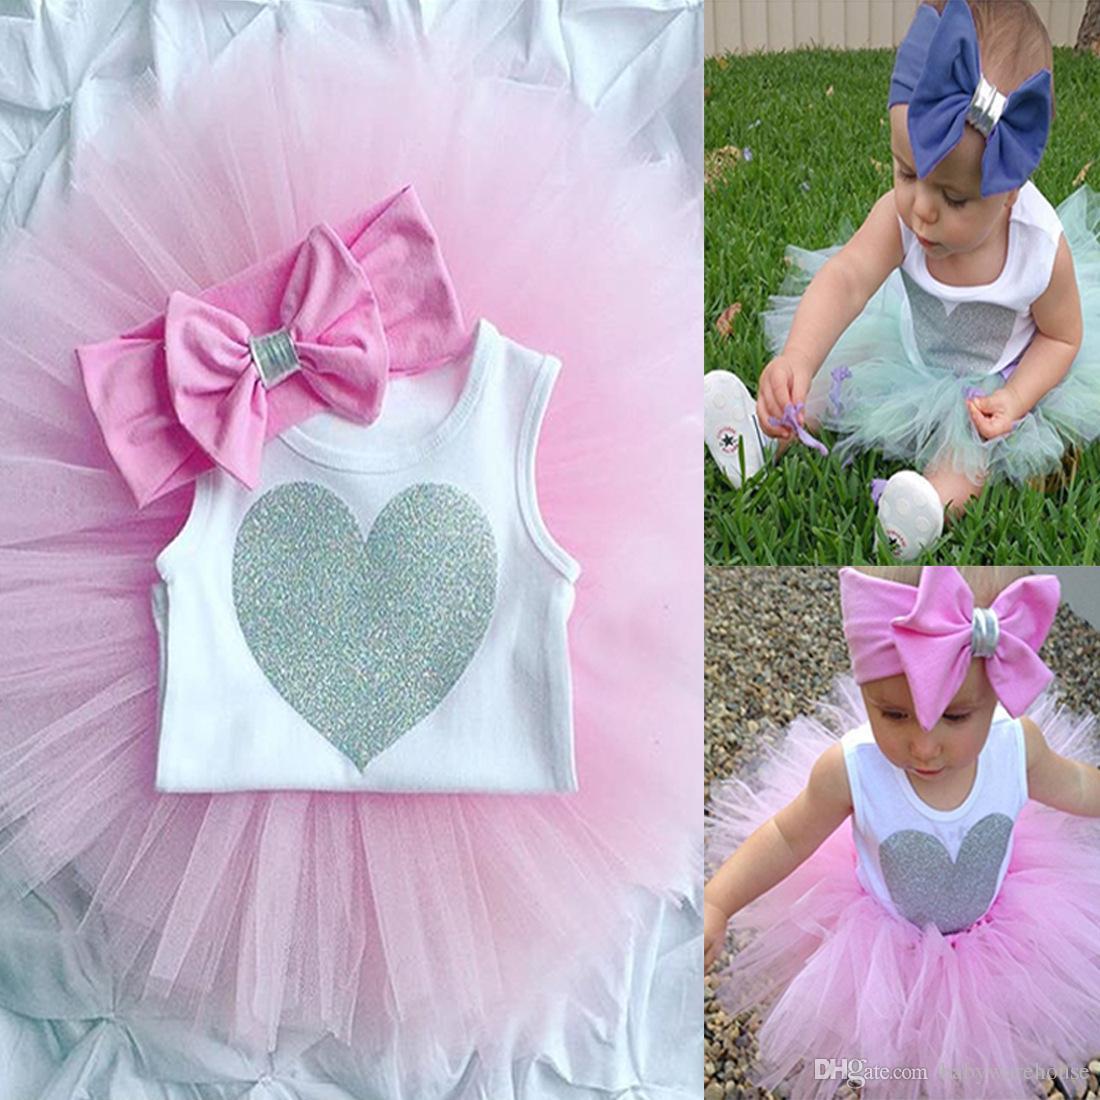 Sommer Baby Mädchen Kleidung Set Neugeborenen Herz Form Strampler Overall Tutu Rock Bowknot Stirnband 3 stücke Outfit Kinder Kleidung Set 2 Farben